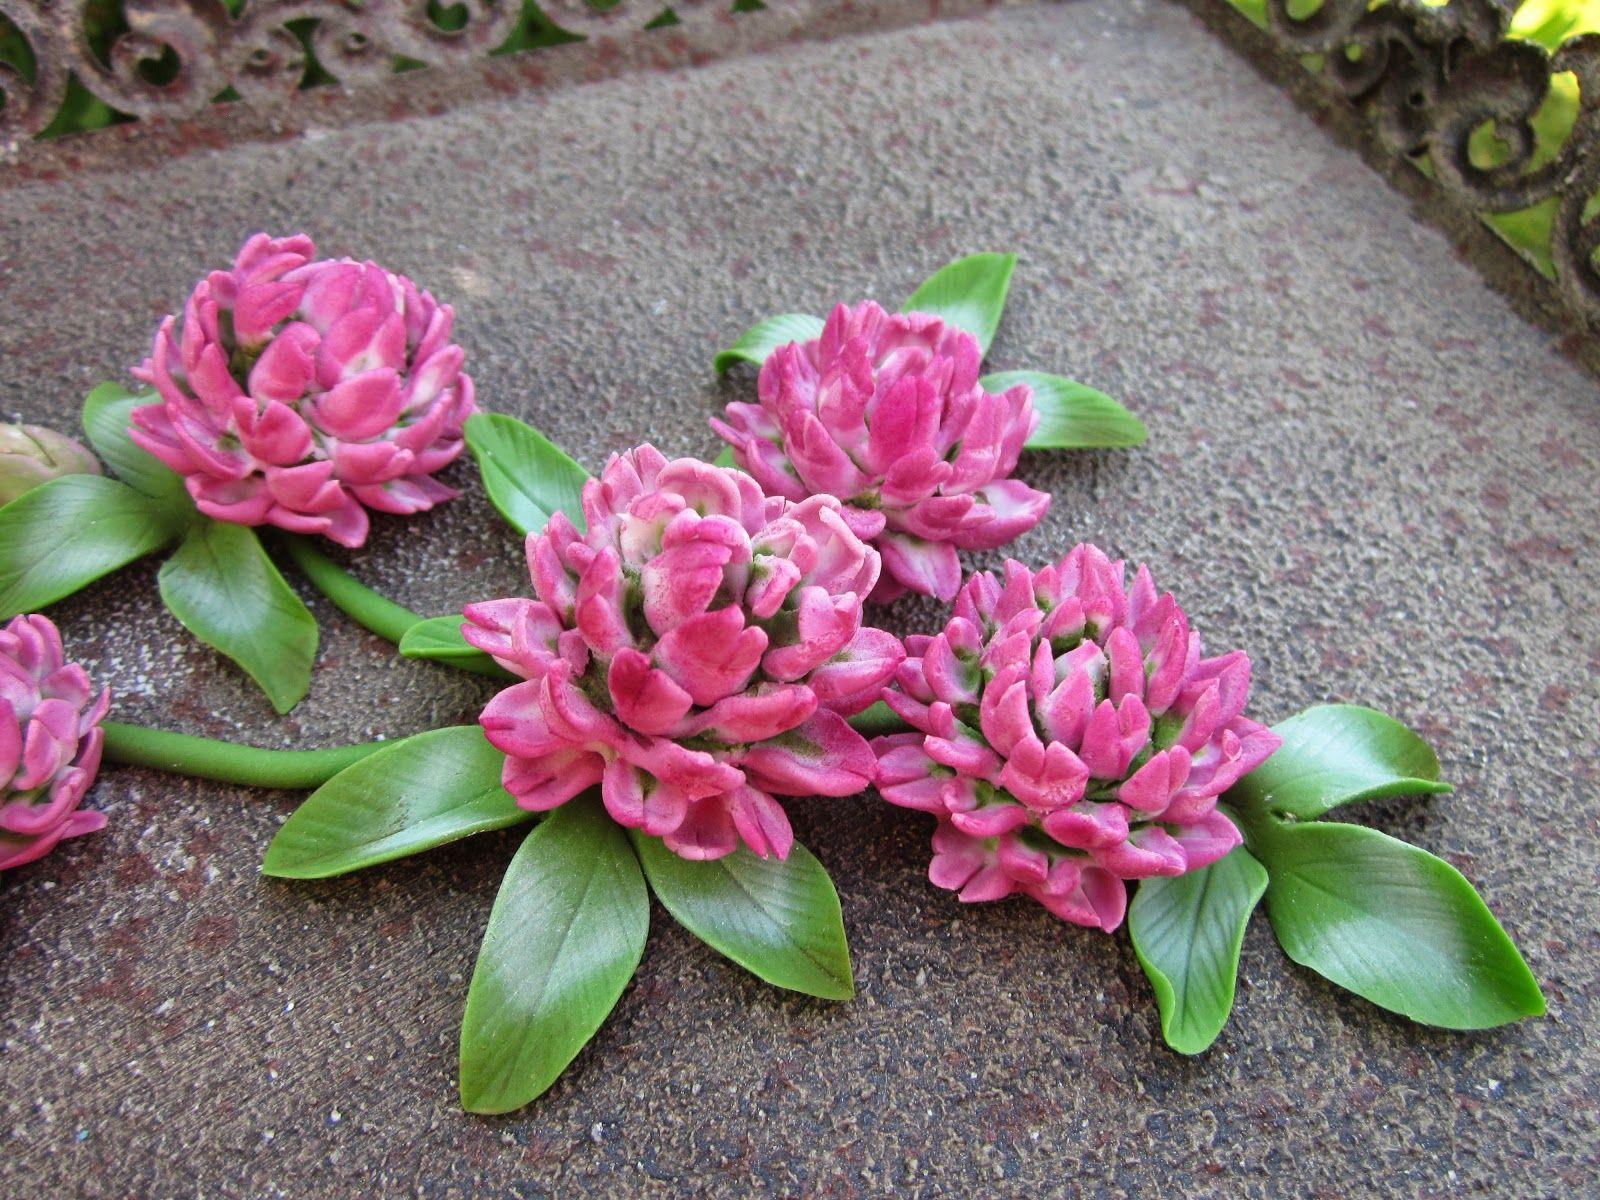 FREE TUTORIAL: polymer clay flowers. Mansikkamäki: Apilankukka